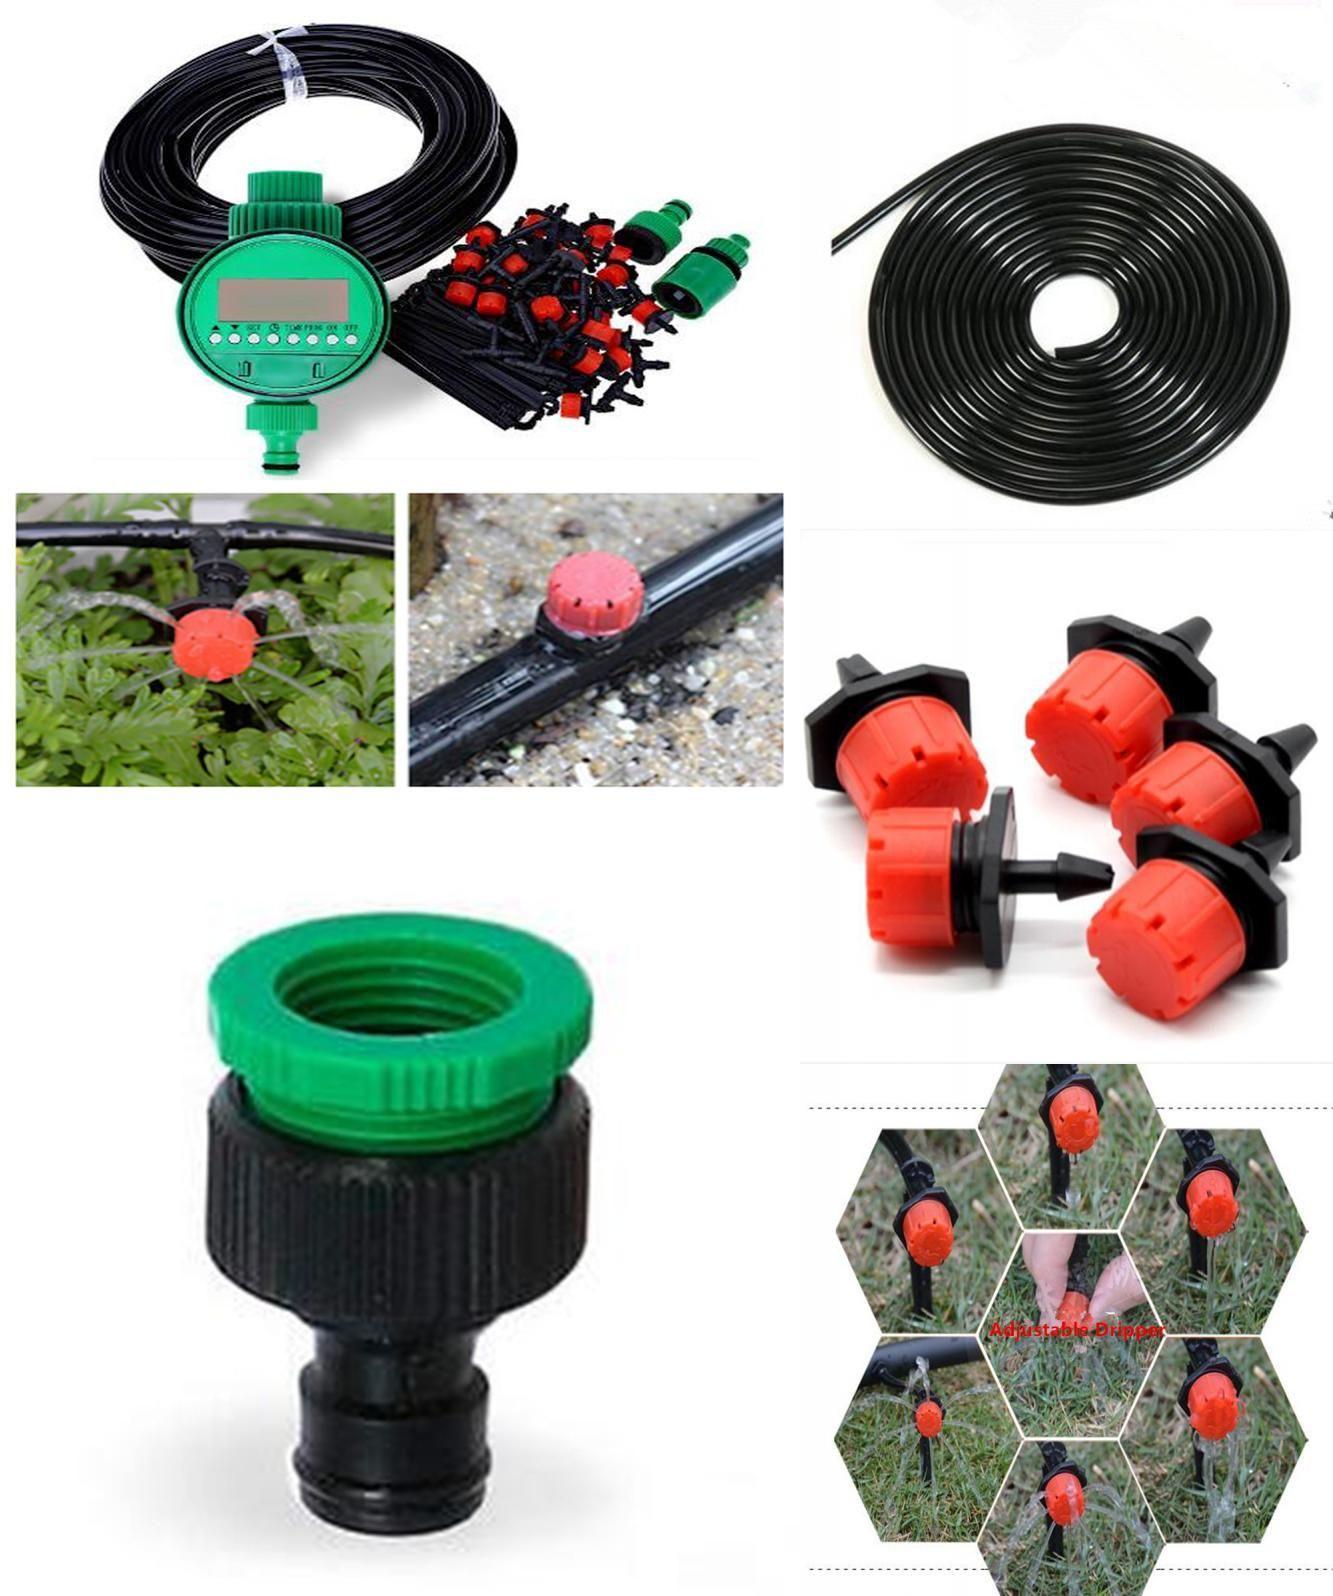 25 M Auto Irrigation System Garden Drip Watering Micro Self Plant Diy Hose Kit